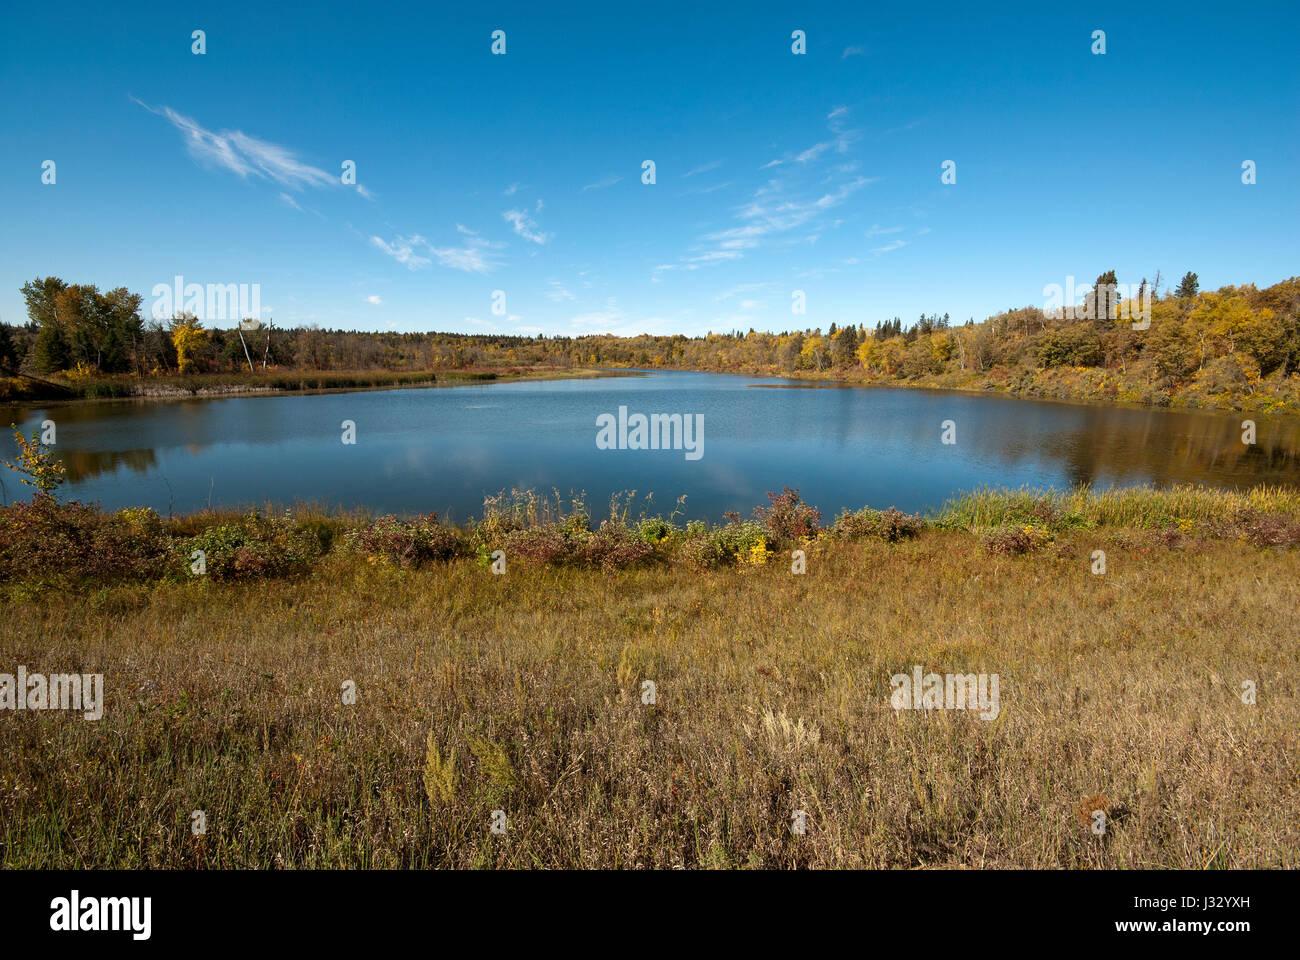 Marshs lake, Spruce Woods Provincial Park, Manitoba, Canada - Stock Image